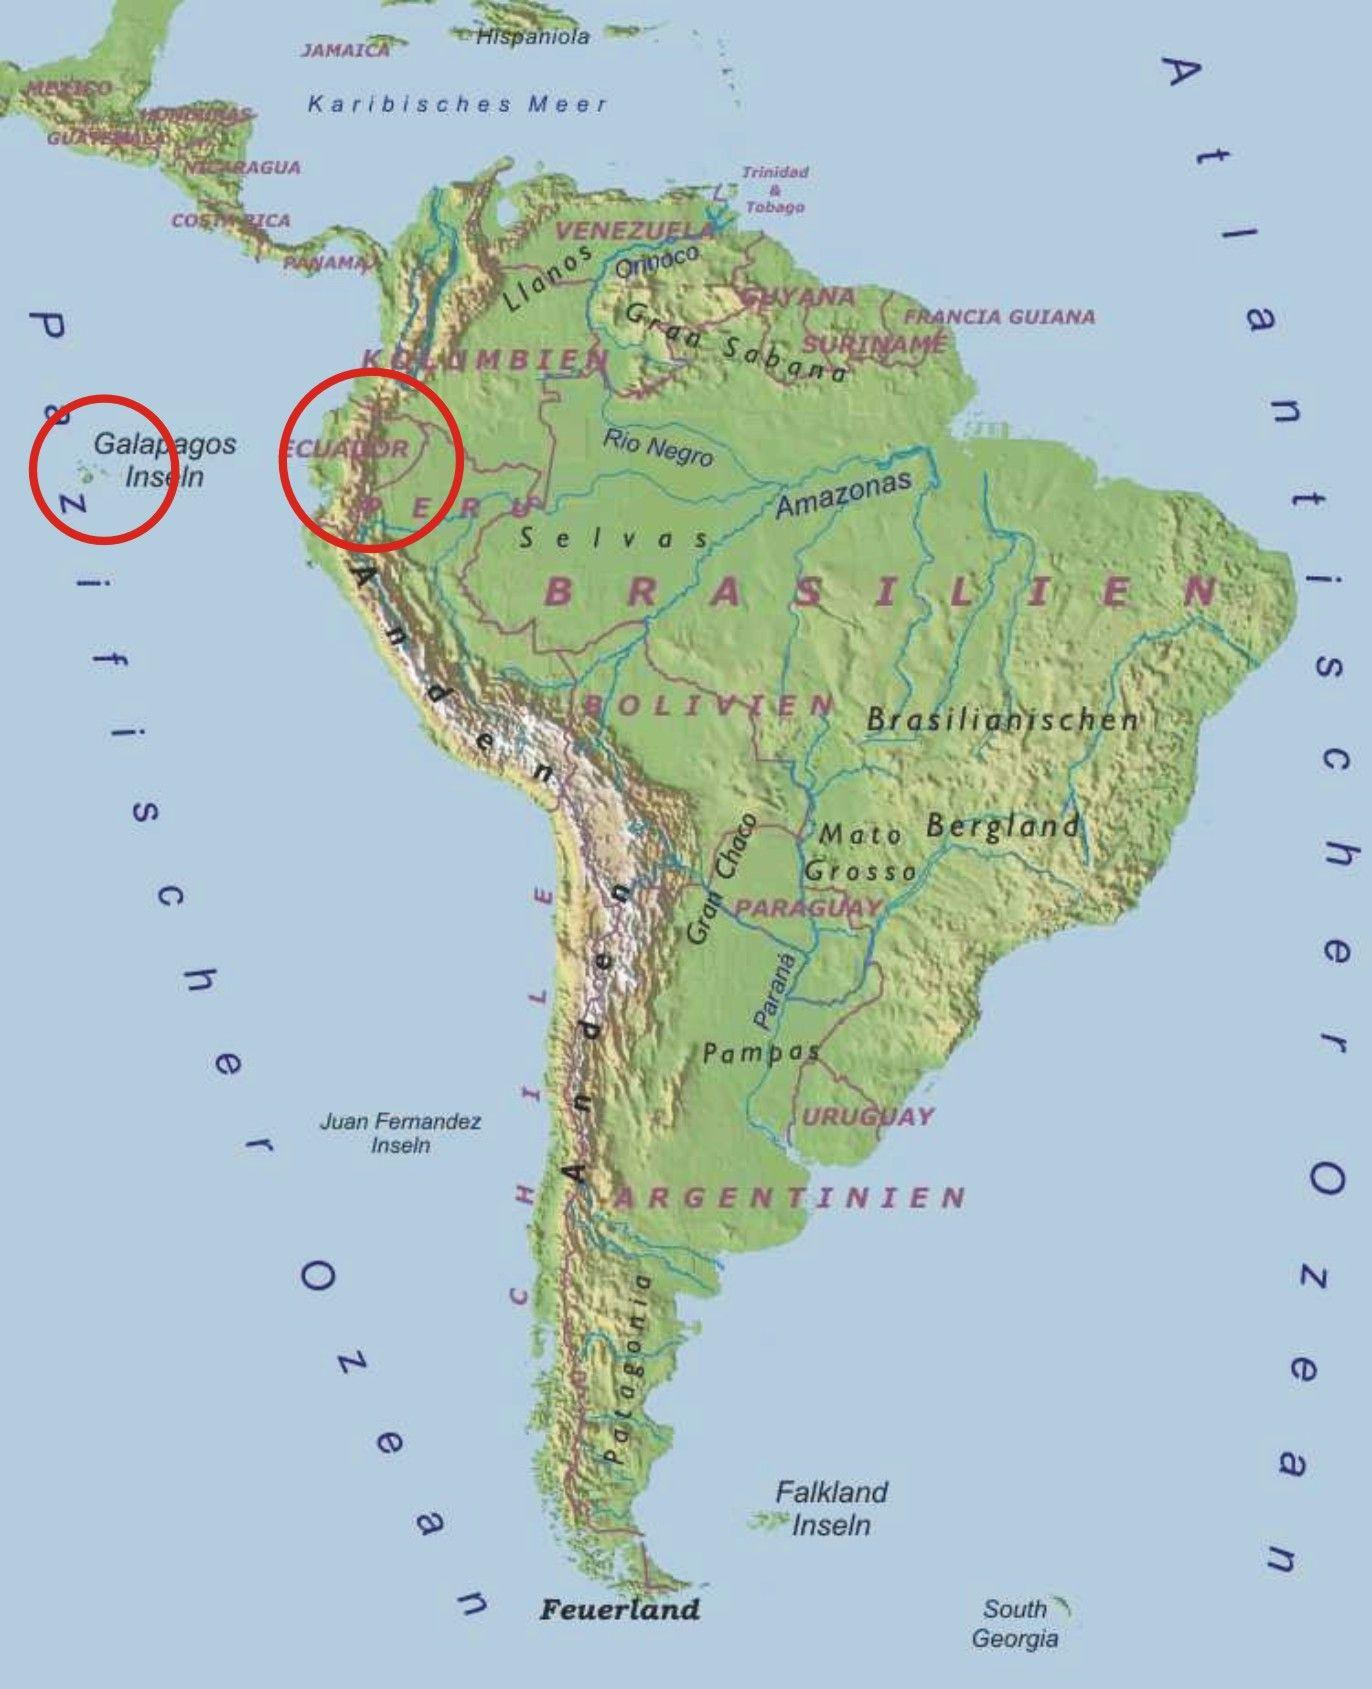 galapagos inseln karte Wo die Inseln sind | Galapados Inseln | Map und Diagram